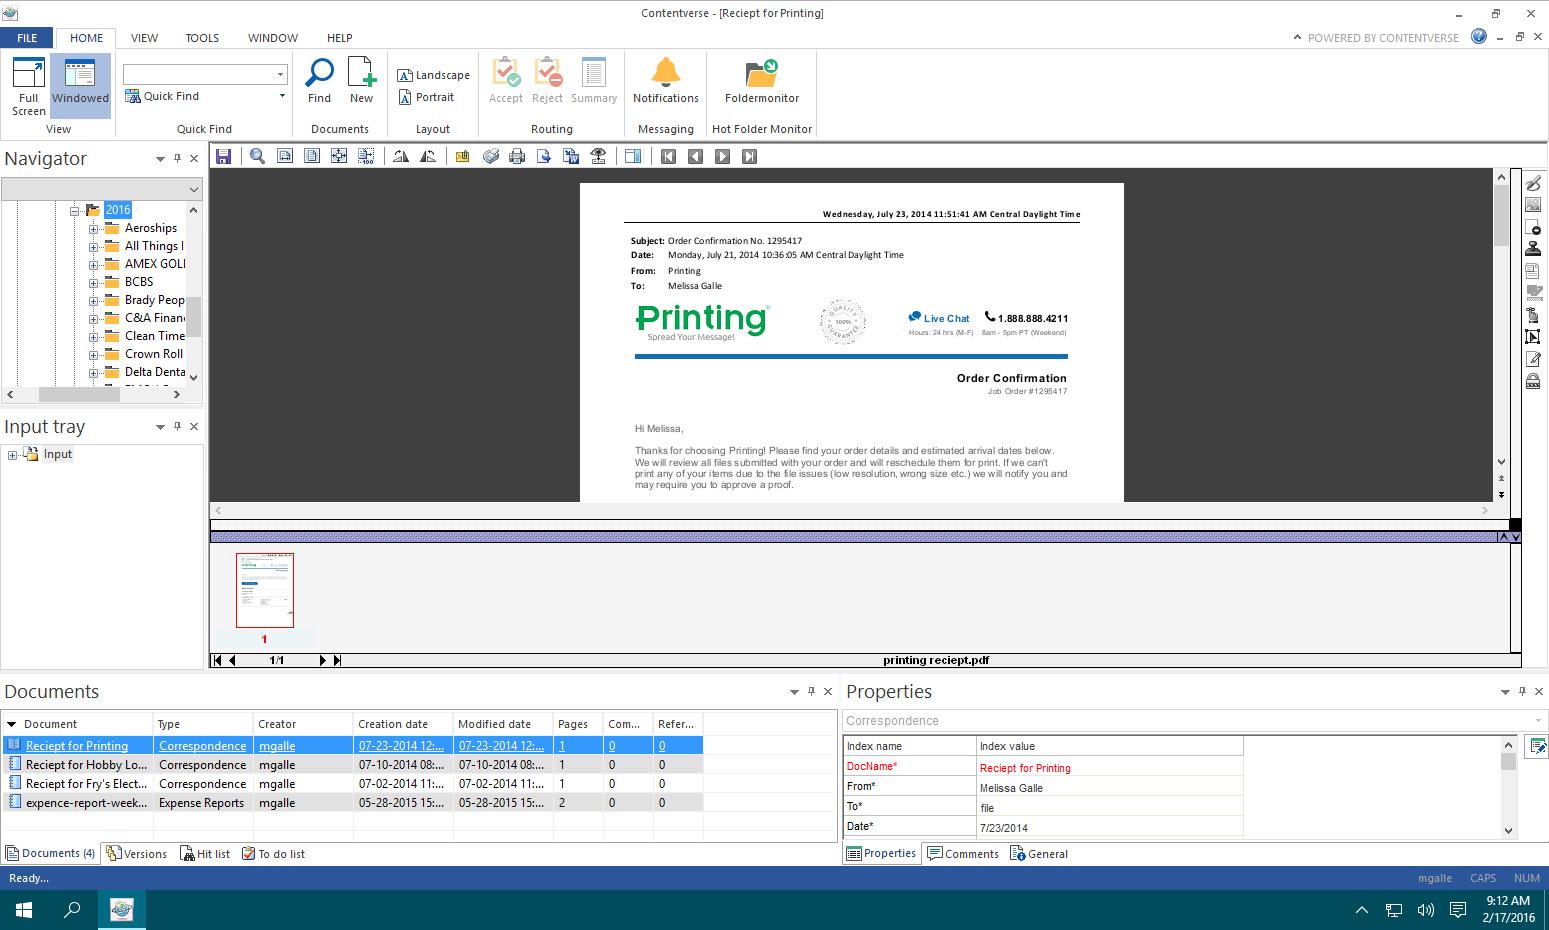 Contentverse Demo - Contentverse-Screenshot.png